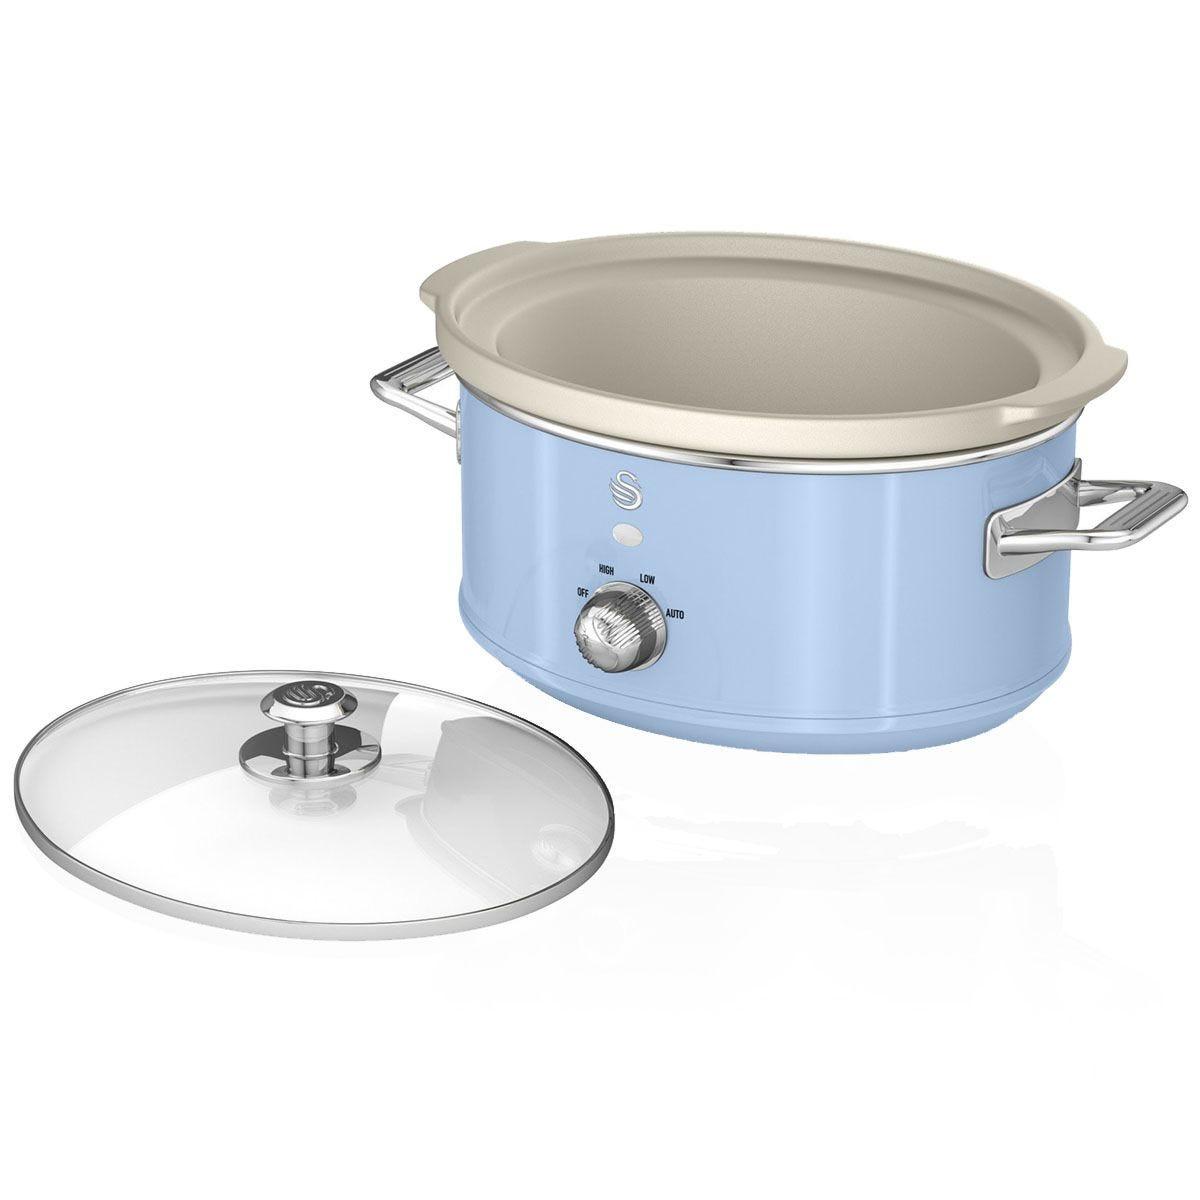 Swan SF17031BLN 6.5L Slow Cooker Retro - Blue